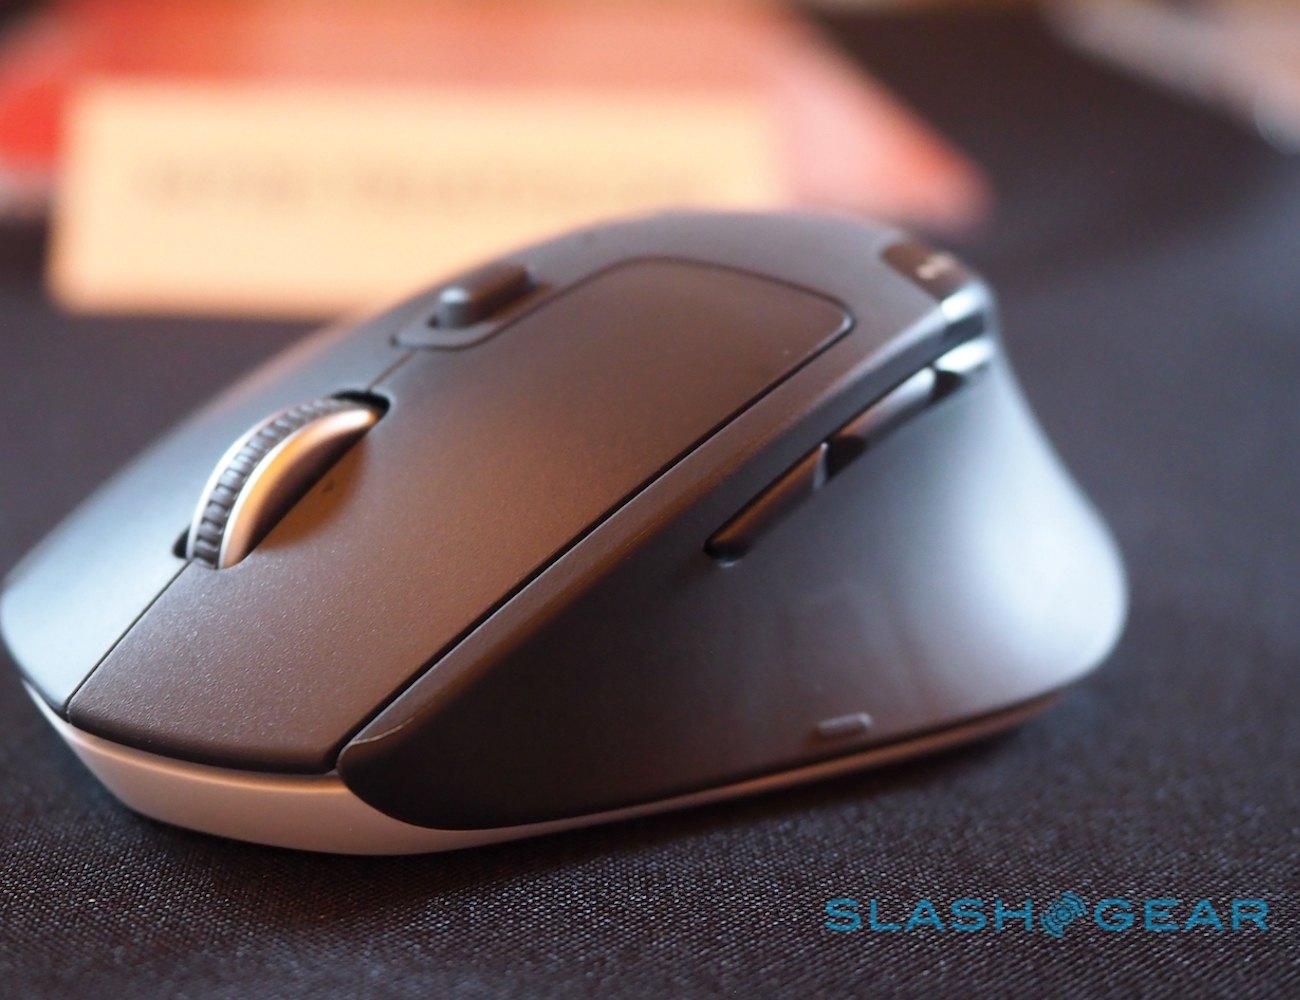 Logitech M720 Triathlon Multi-Device Mouse